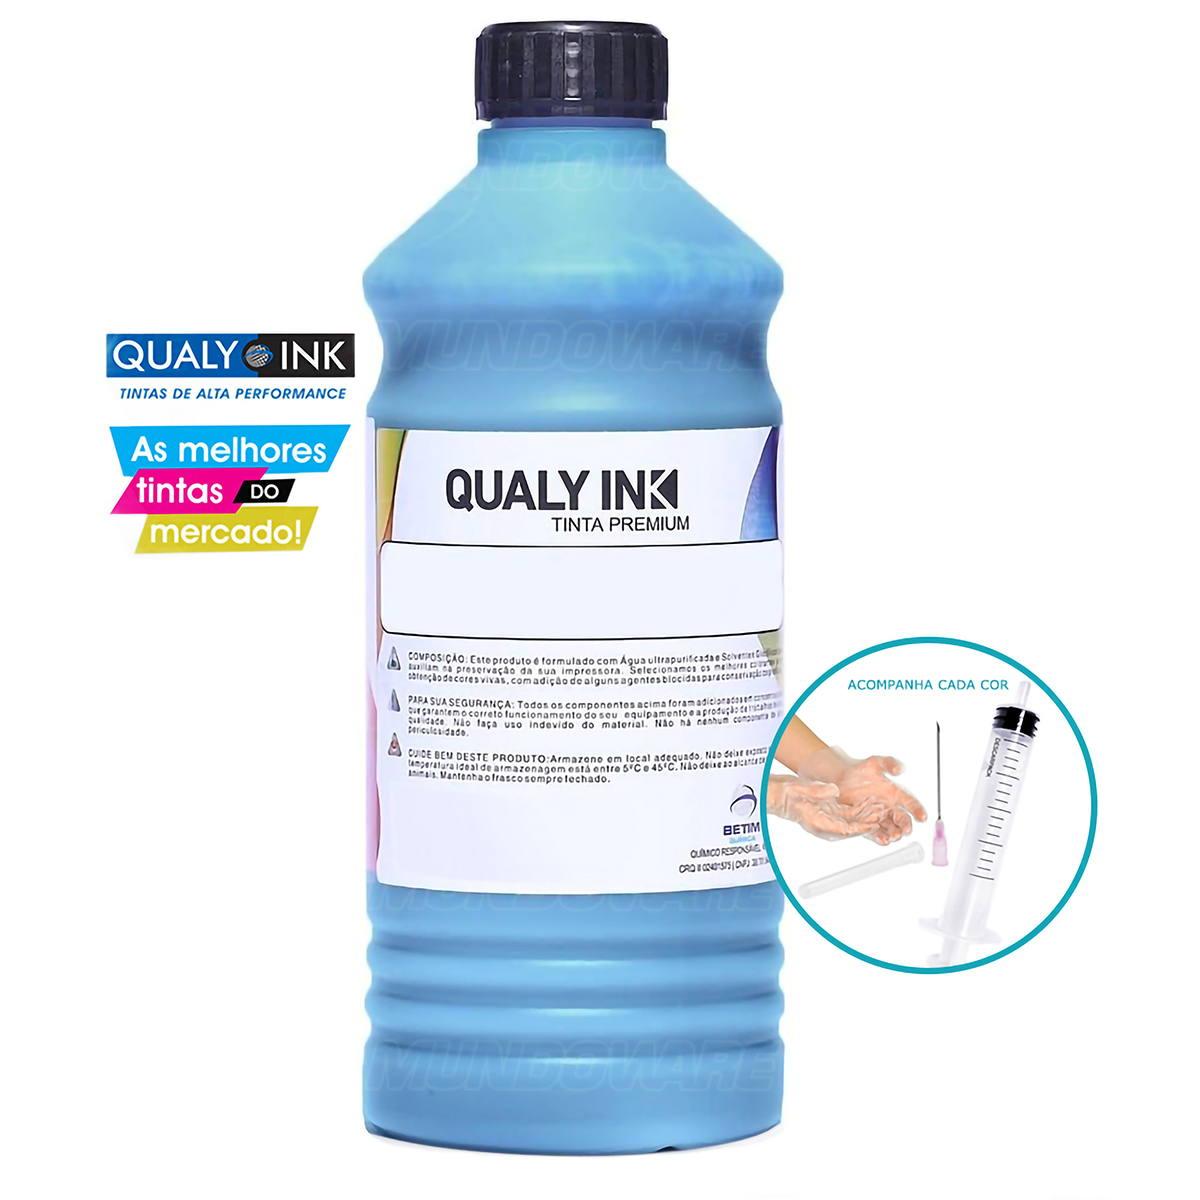 Tinta Corante Qualy-Ink Universal para Cartucho Bulk Ink e Tanque de Tinta Ciano Refil 1L